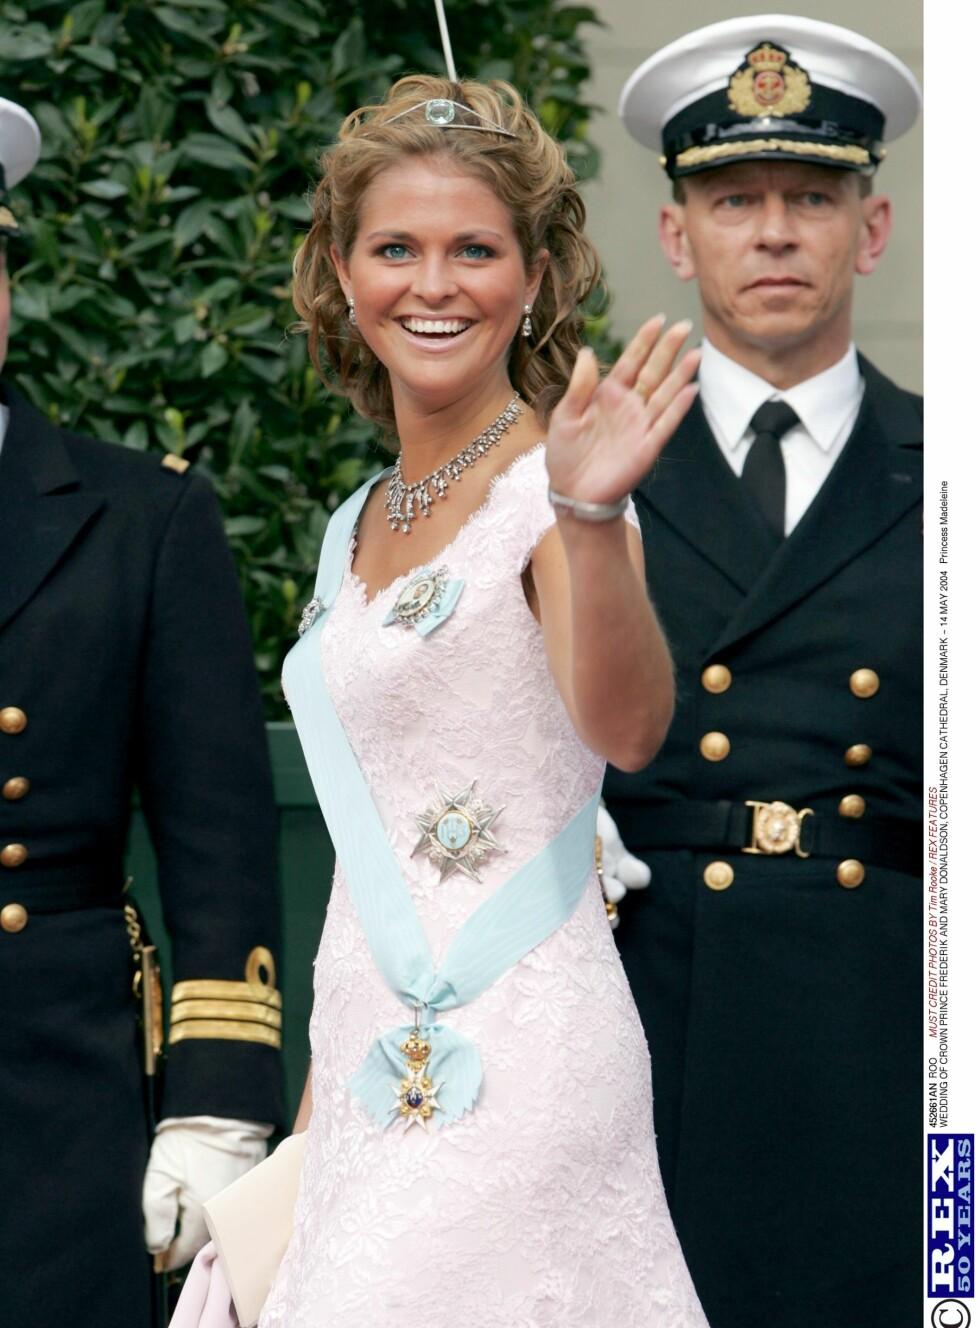 Bryllup i 2004.  Foto: All Over Press